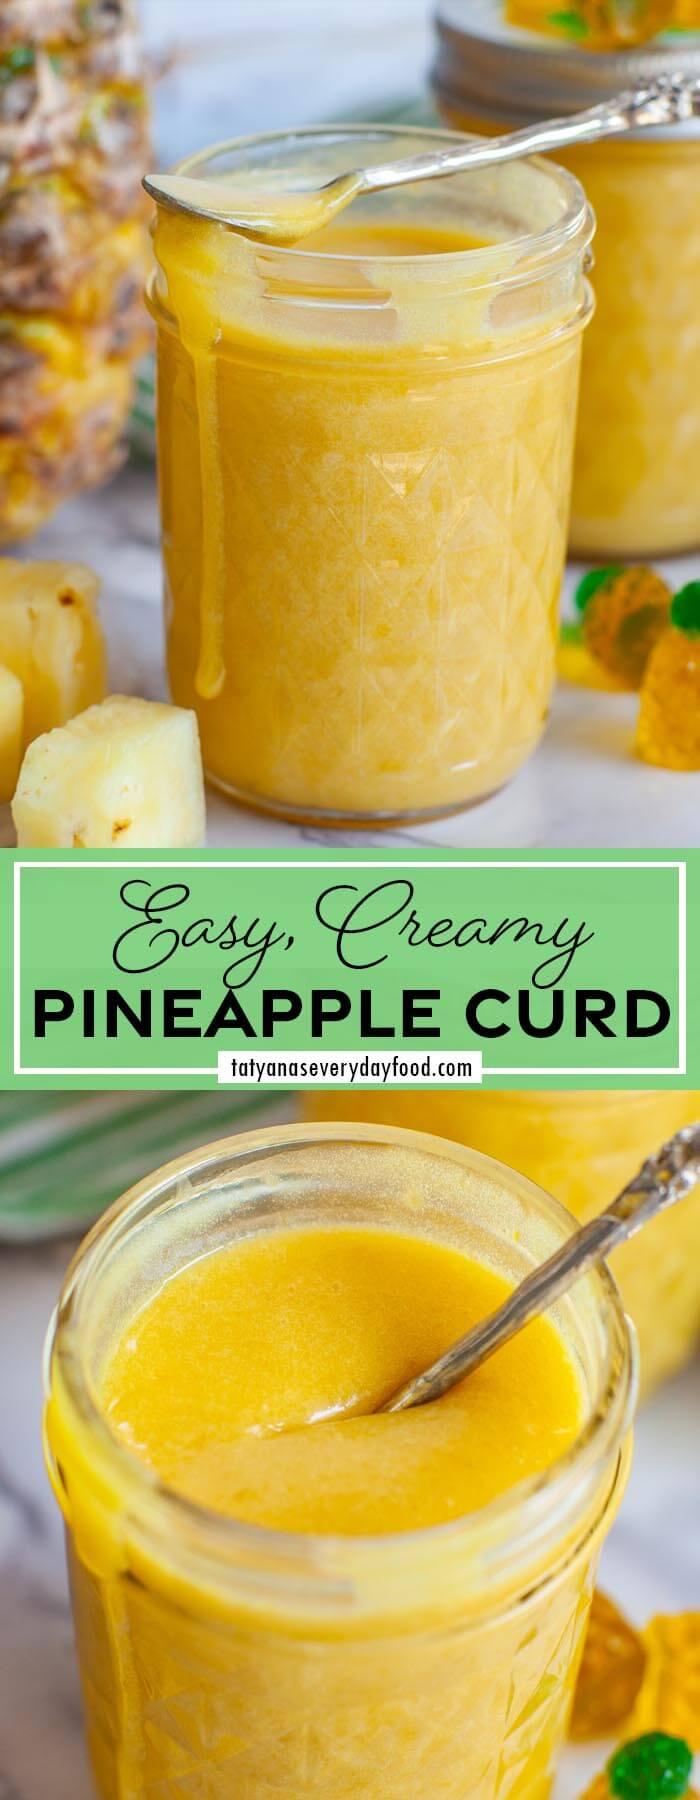 The Best Pineapple Curd video recipe board